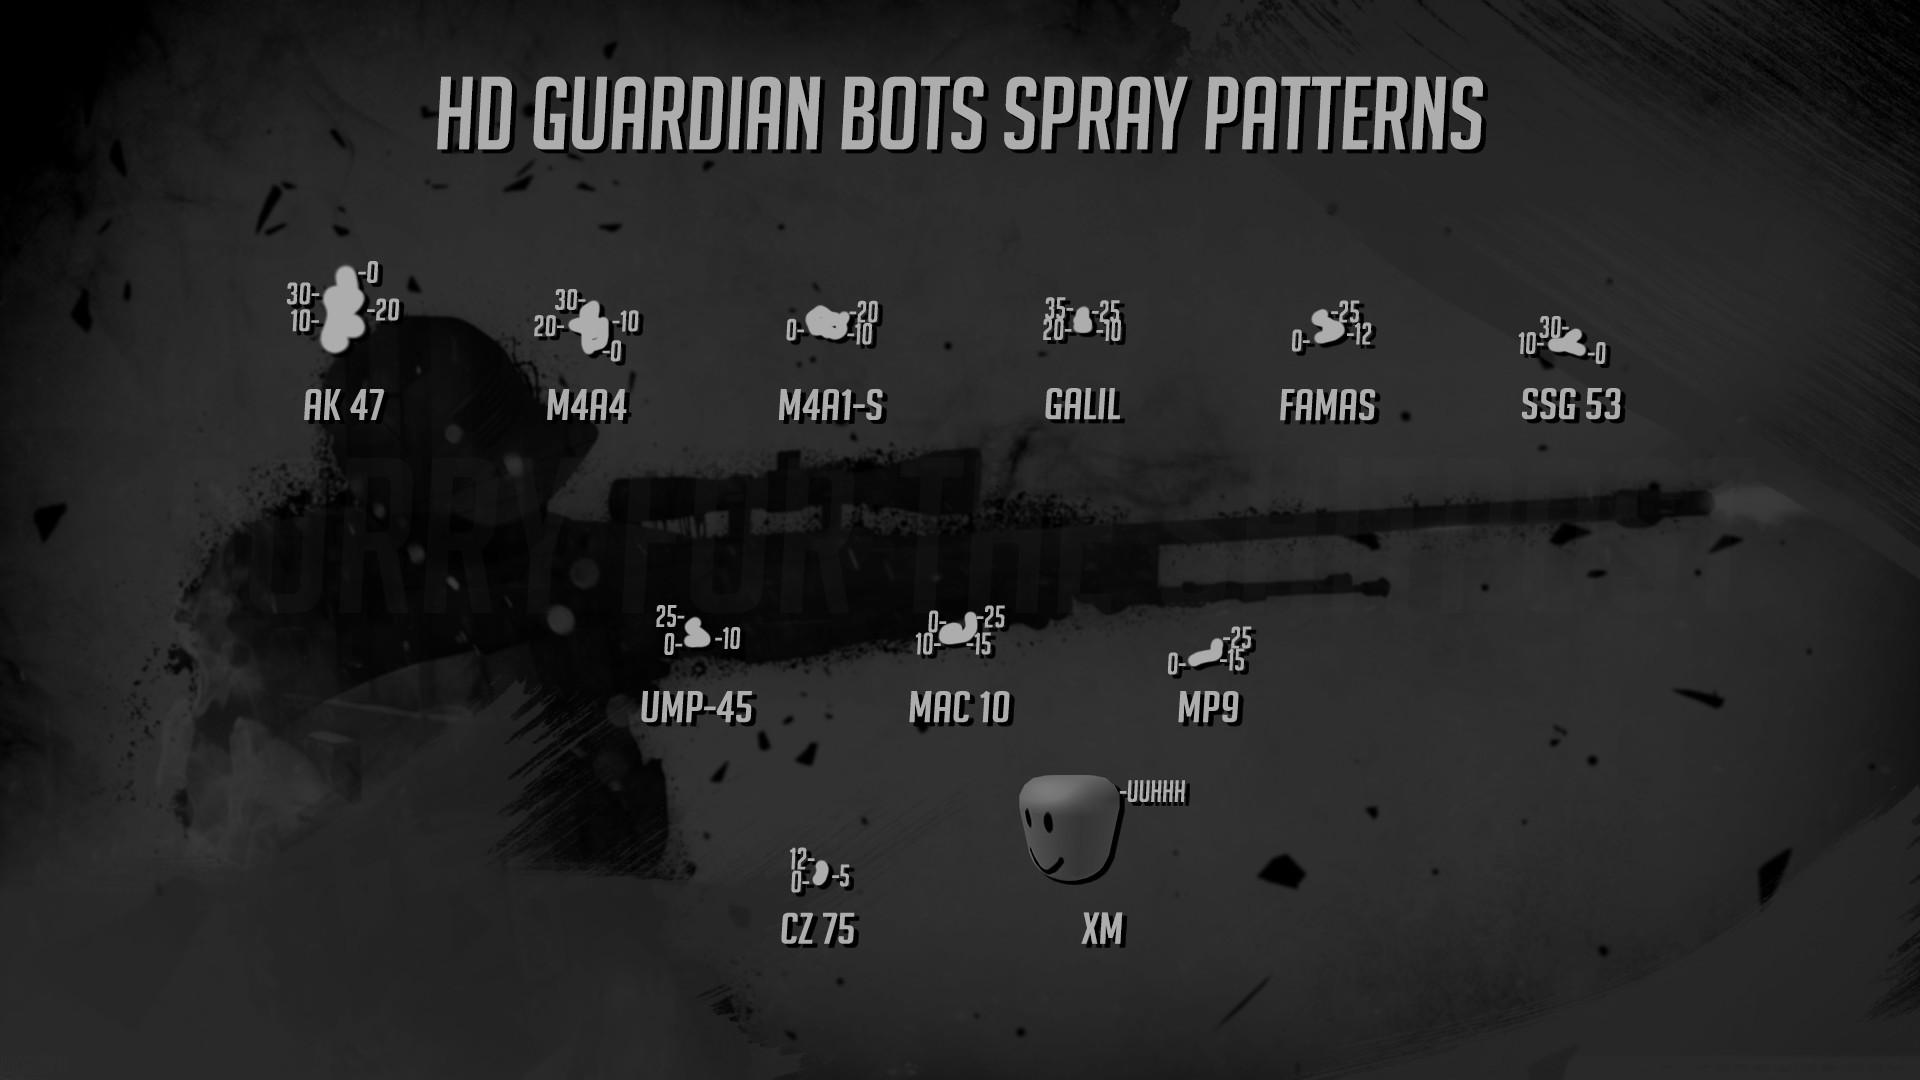 HD Guardian Bots Spray Patterns Wallpaper #games #globaloffensive #CSGO  #counterstrike #hltv